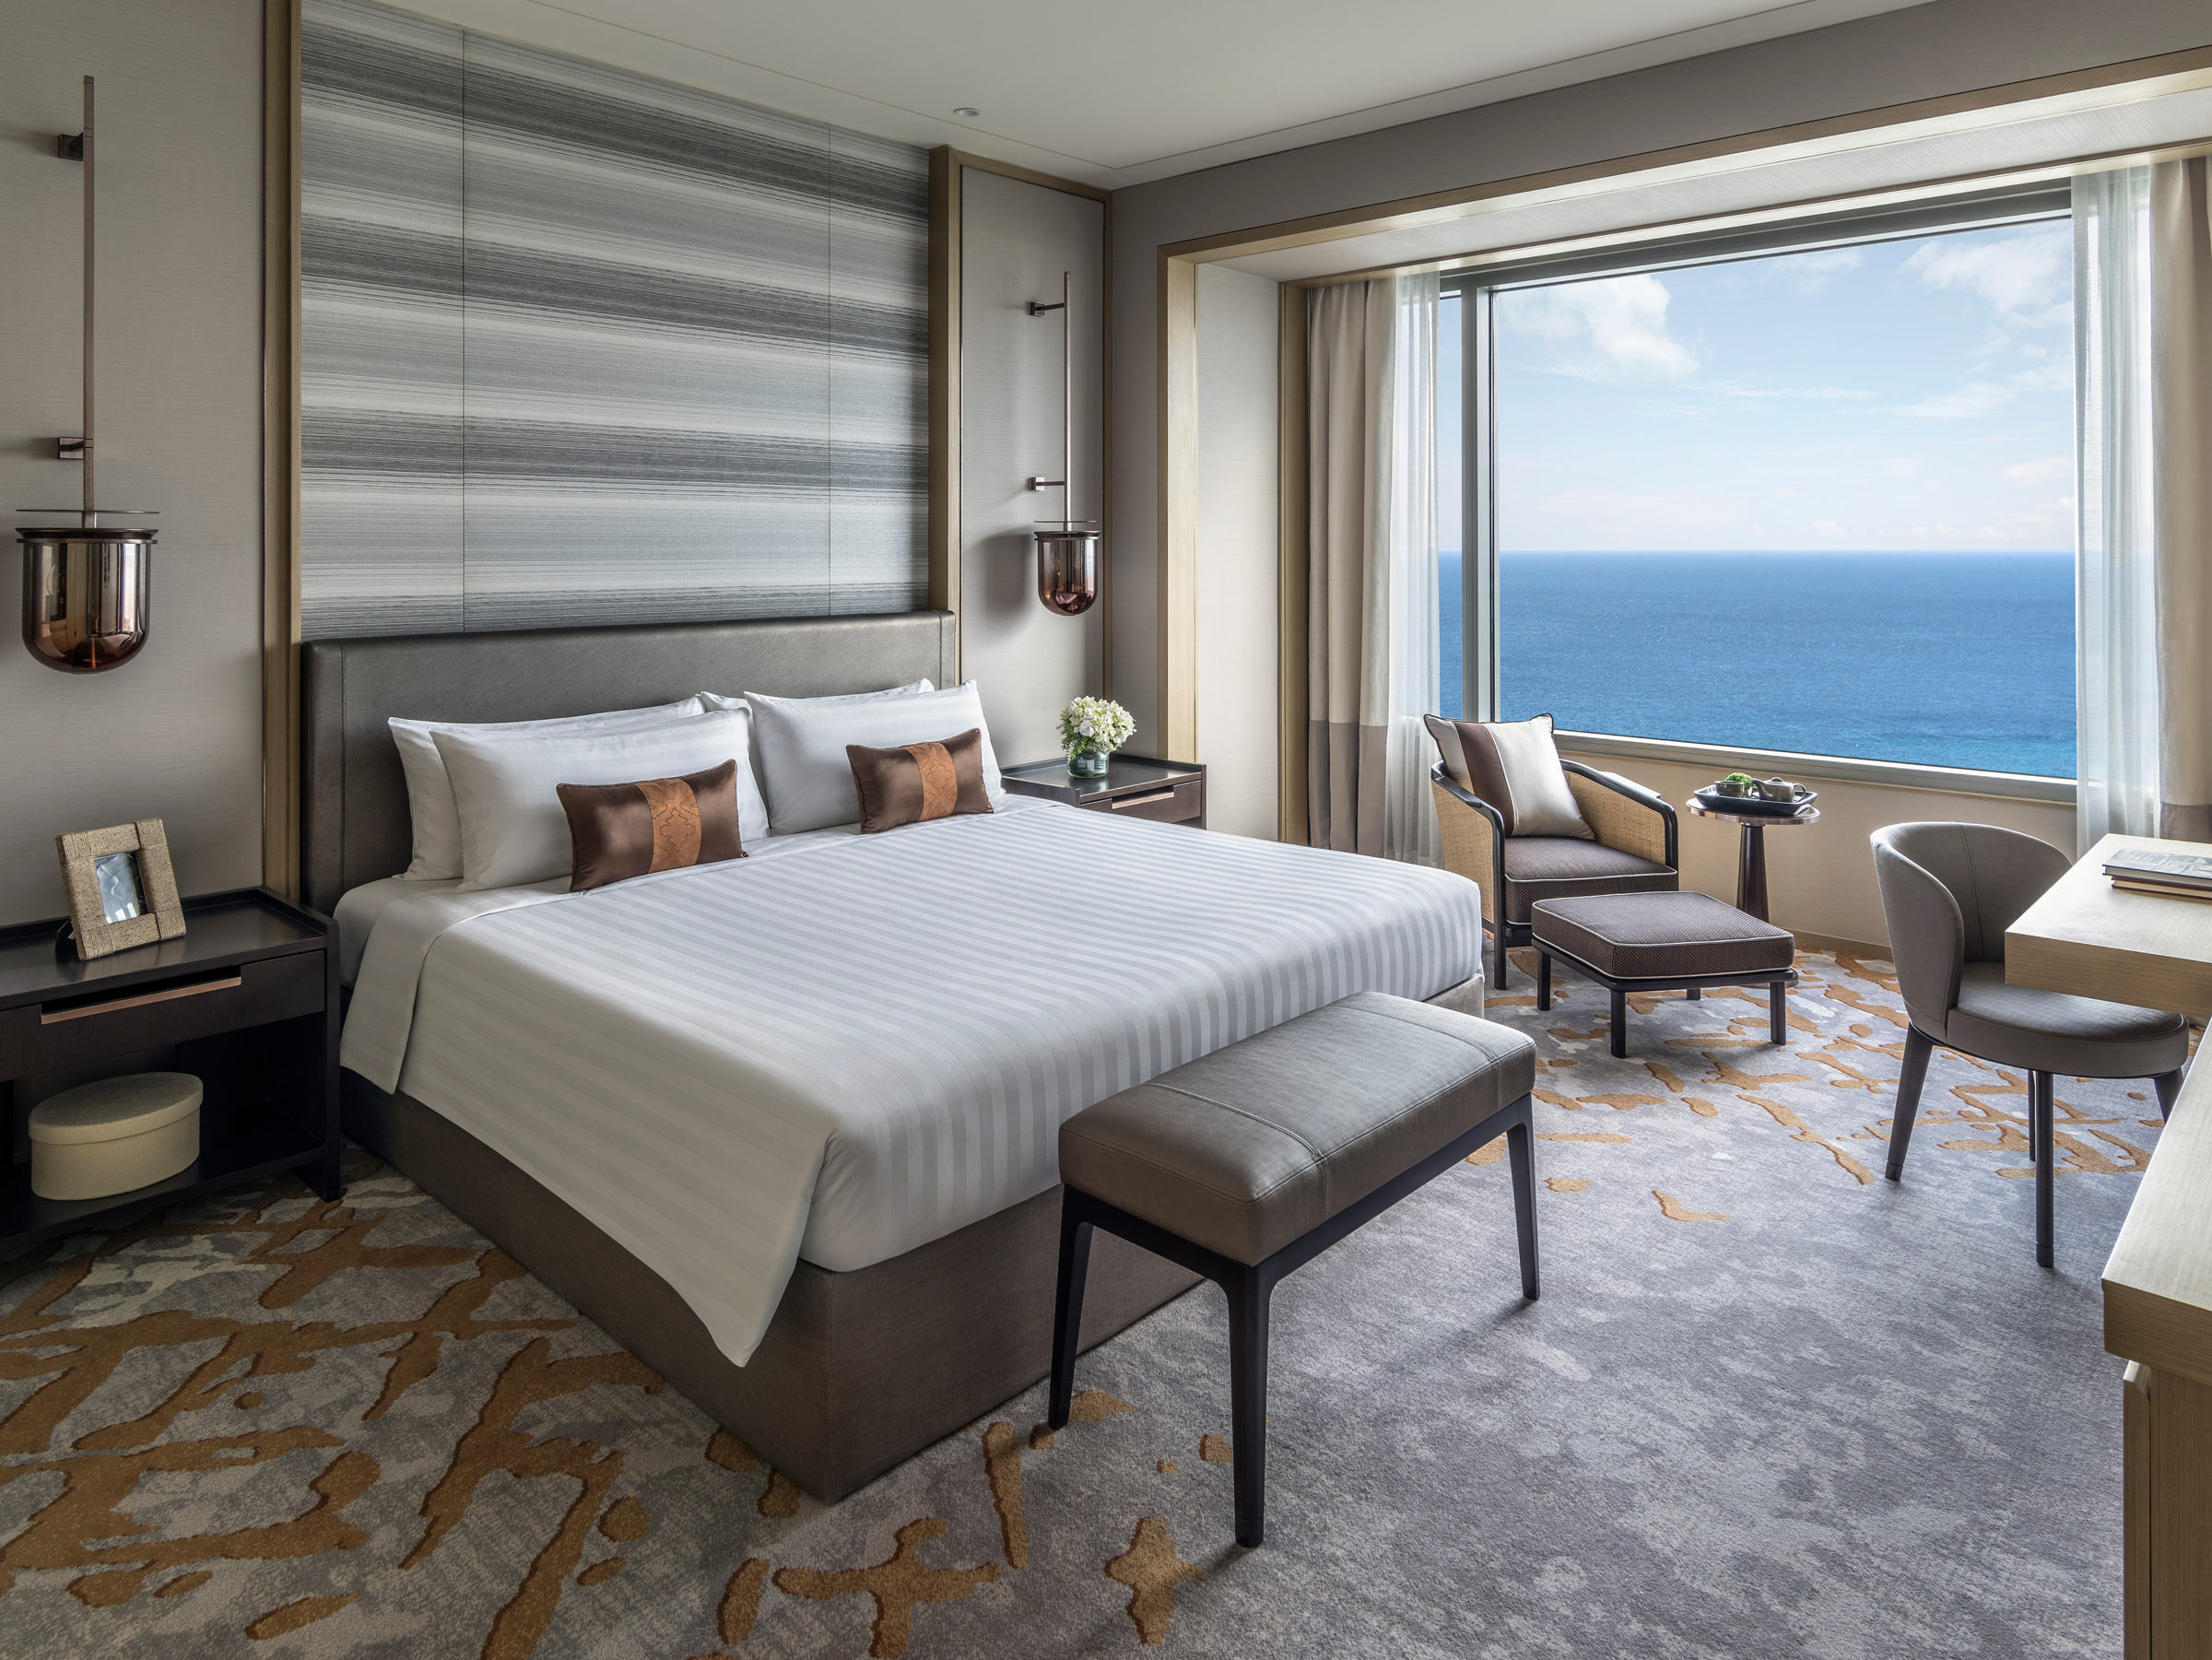 LTW_Shangri-La_Colombo_Serviced_Apartment_Bedroom-(Credit-Shangri-La-Colombo).jpg